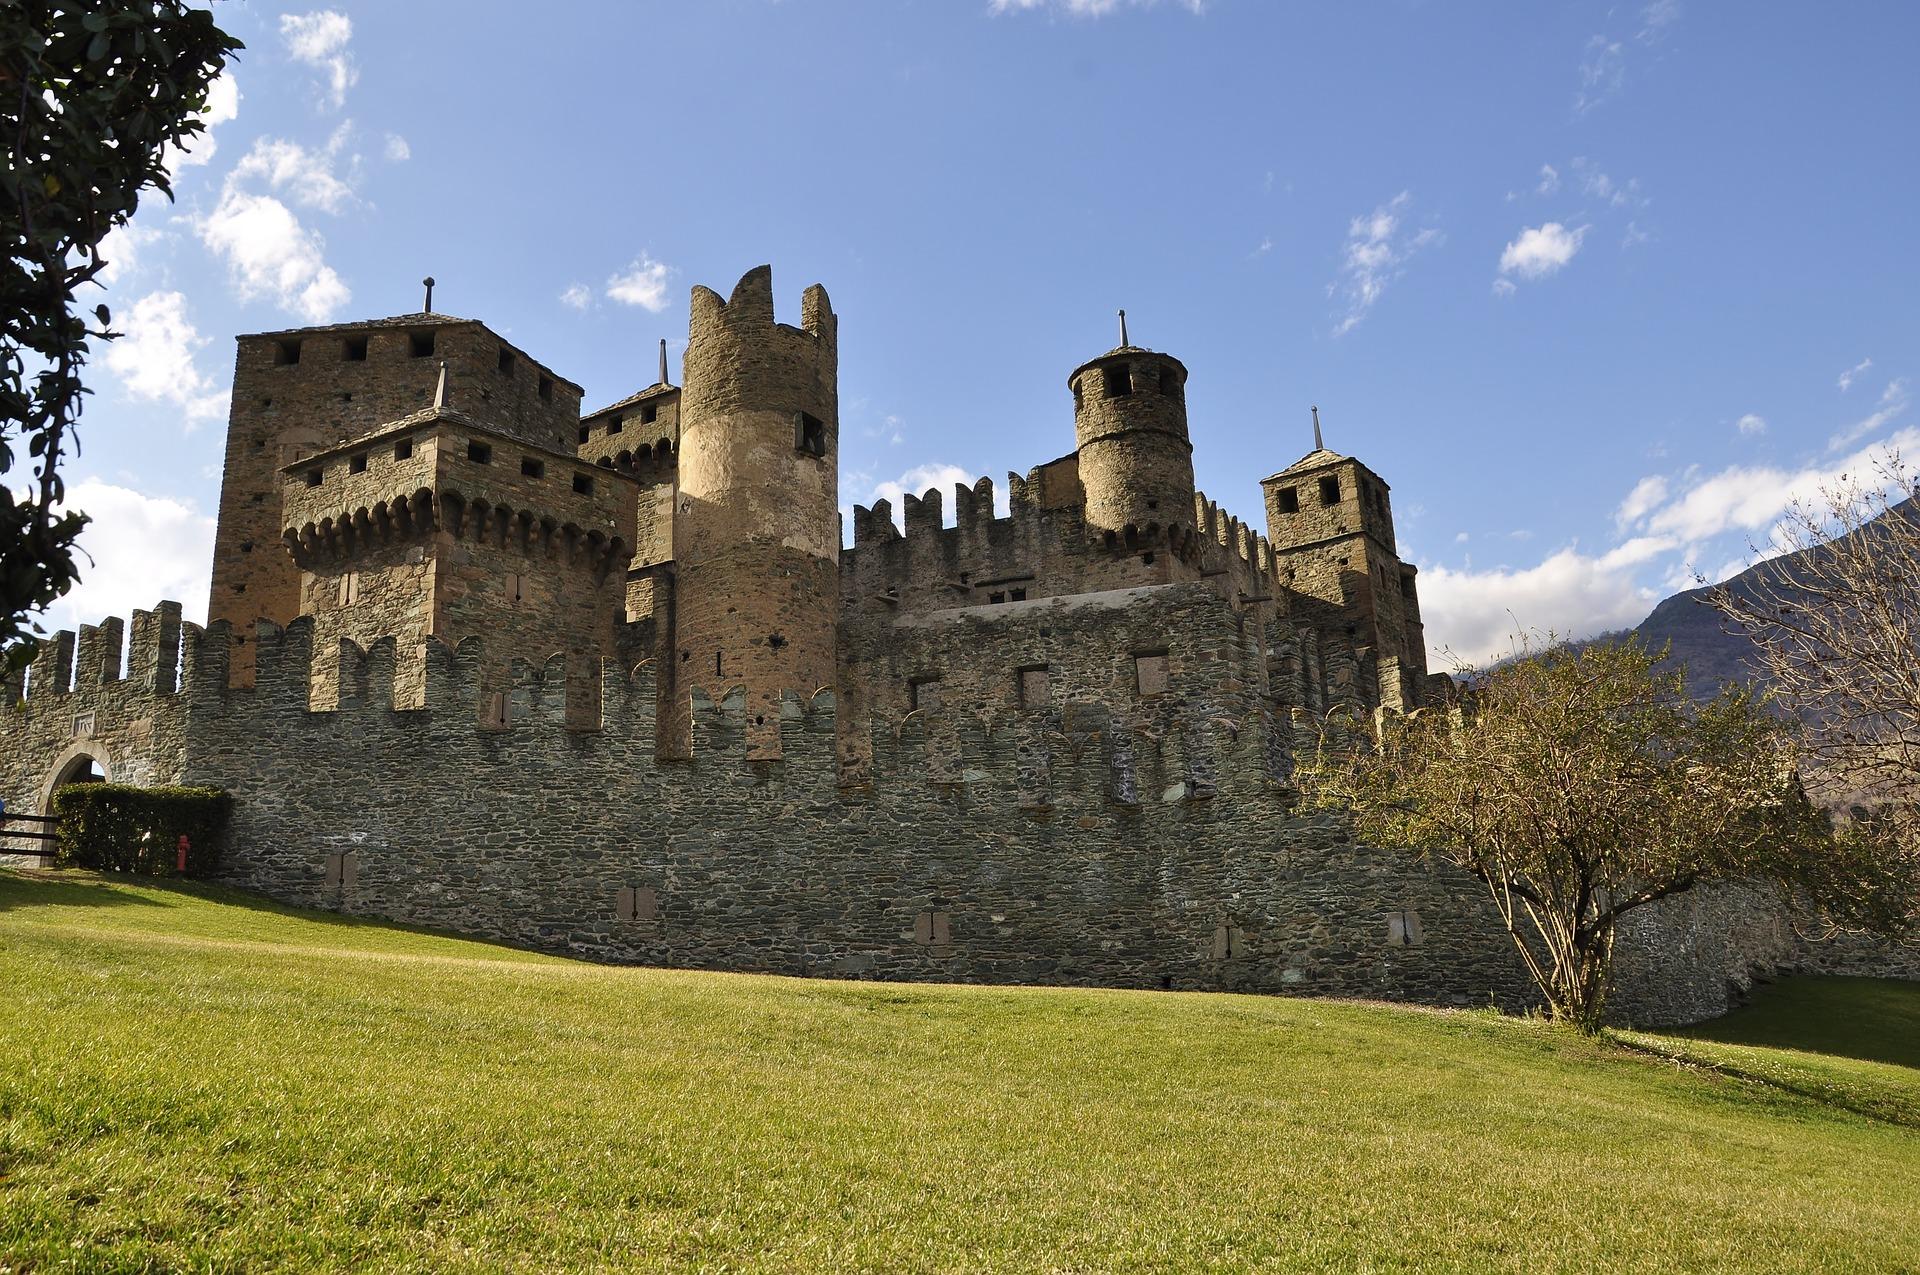 castello di fénis leggende